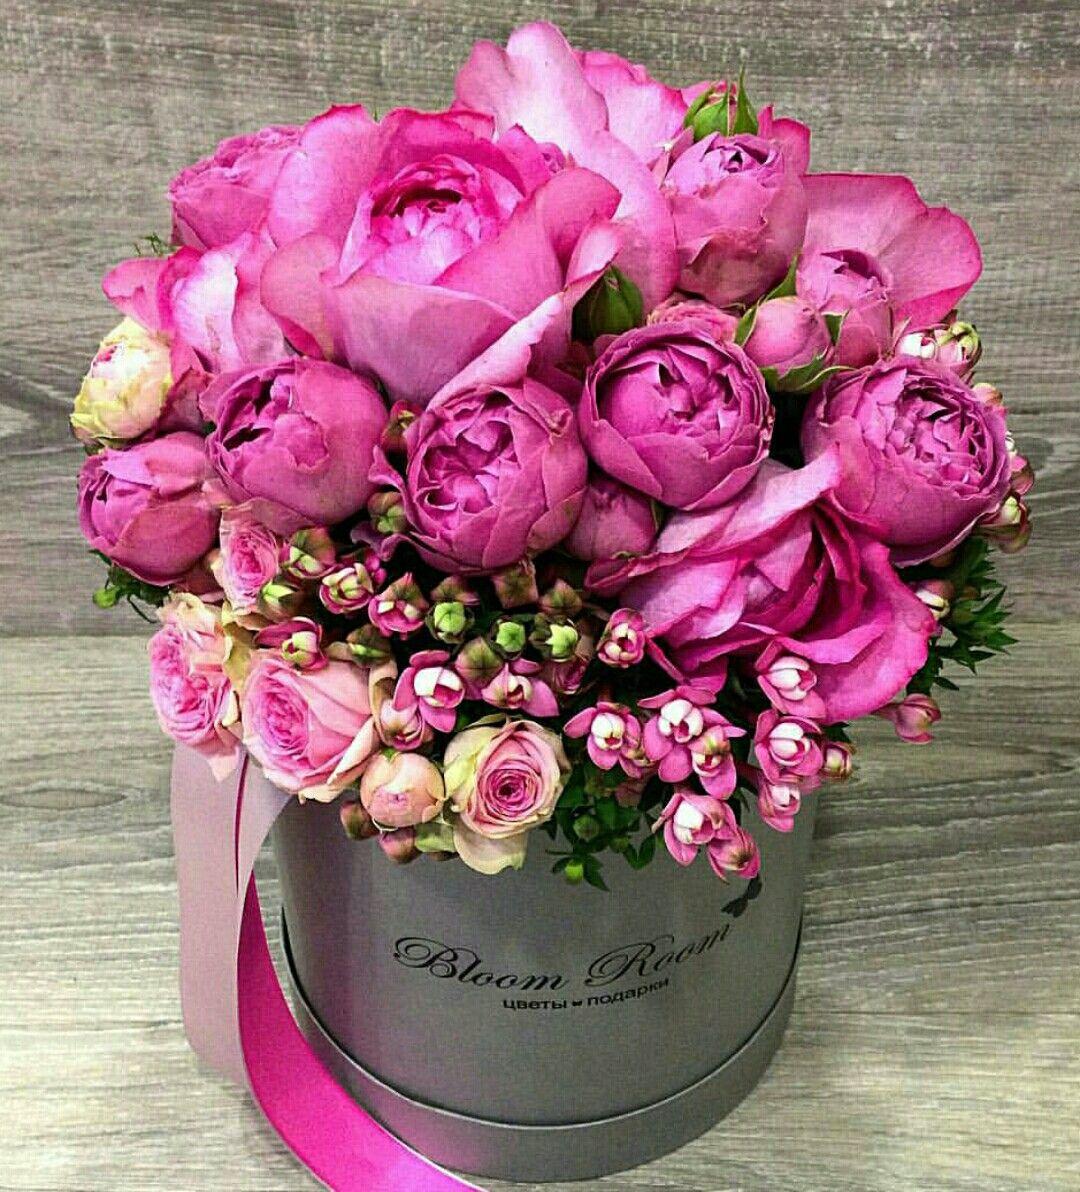 A beautiful floral arrangement of fuschia roses. Flower